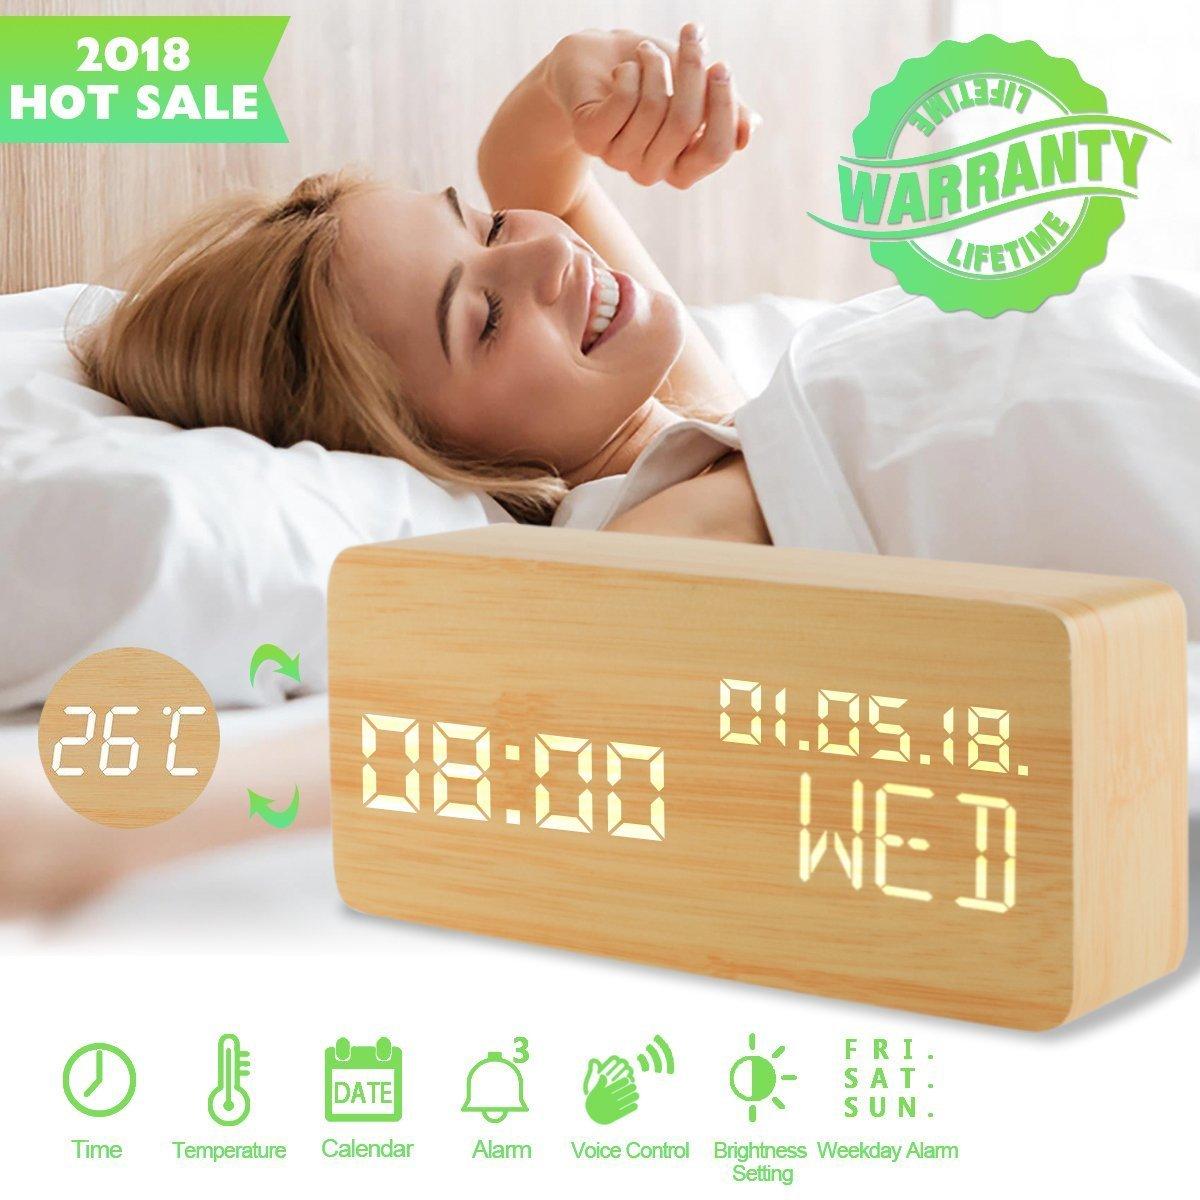 Luckymore Alarm Clock,Wood Alarm Clock Digital Clock LED Small Desk Clock Voice Command Beside Wooden Clock Modern Decoration Mini Alarm Clocks 3 Alarms 3 Level Brightness Show Time Date Week by Luckymore